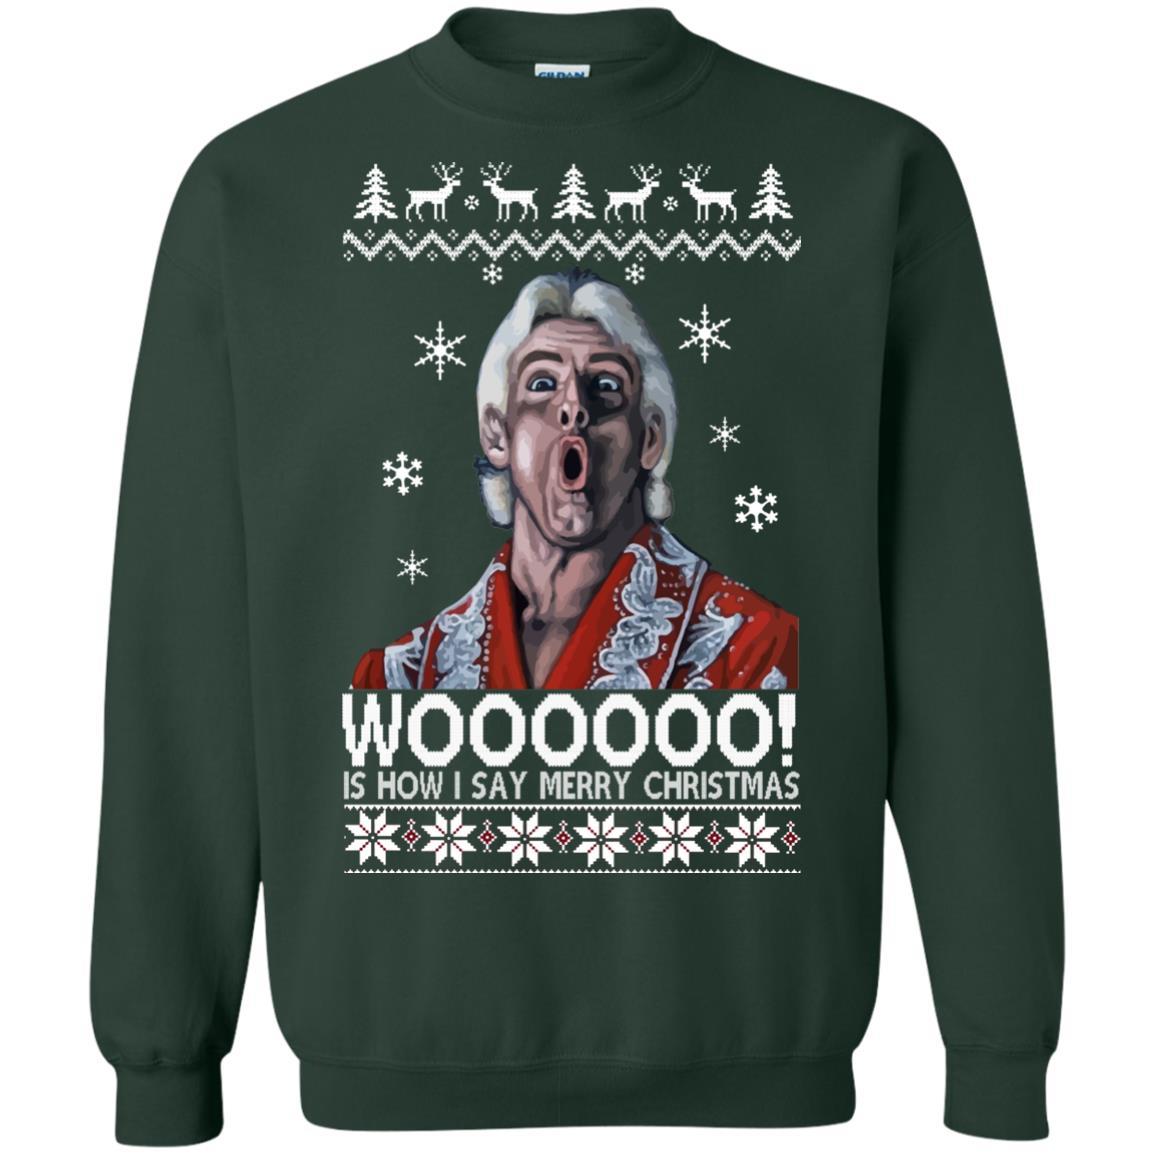 image 1644 - Green Ric Flair WOO Christmas Sweater, Ugly Sweatshirt